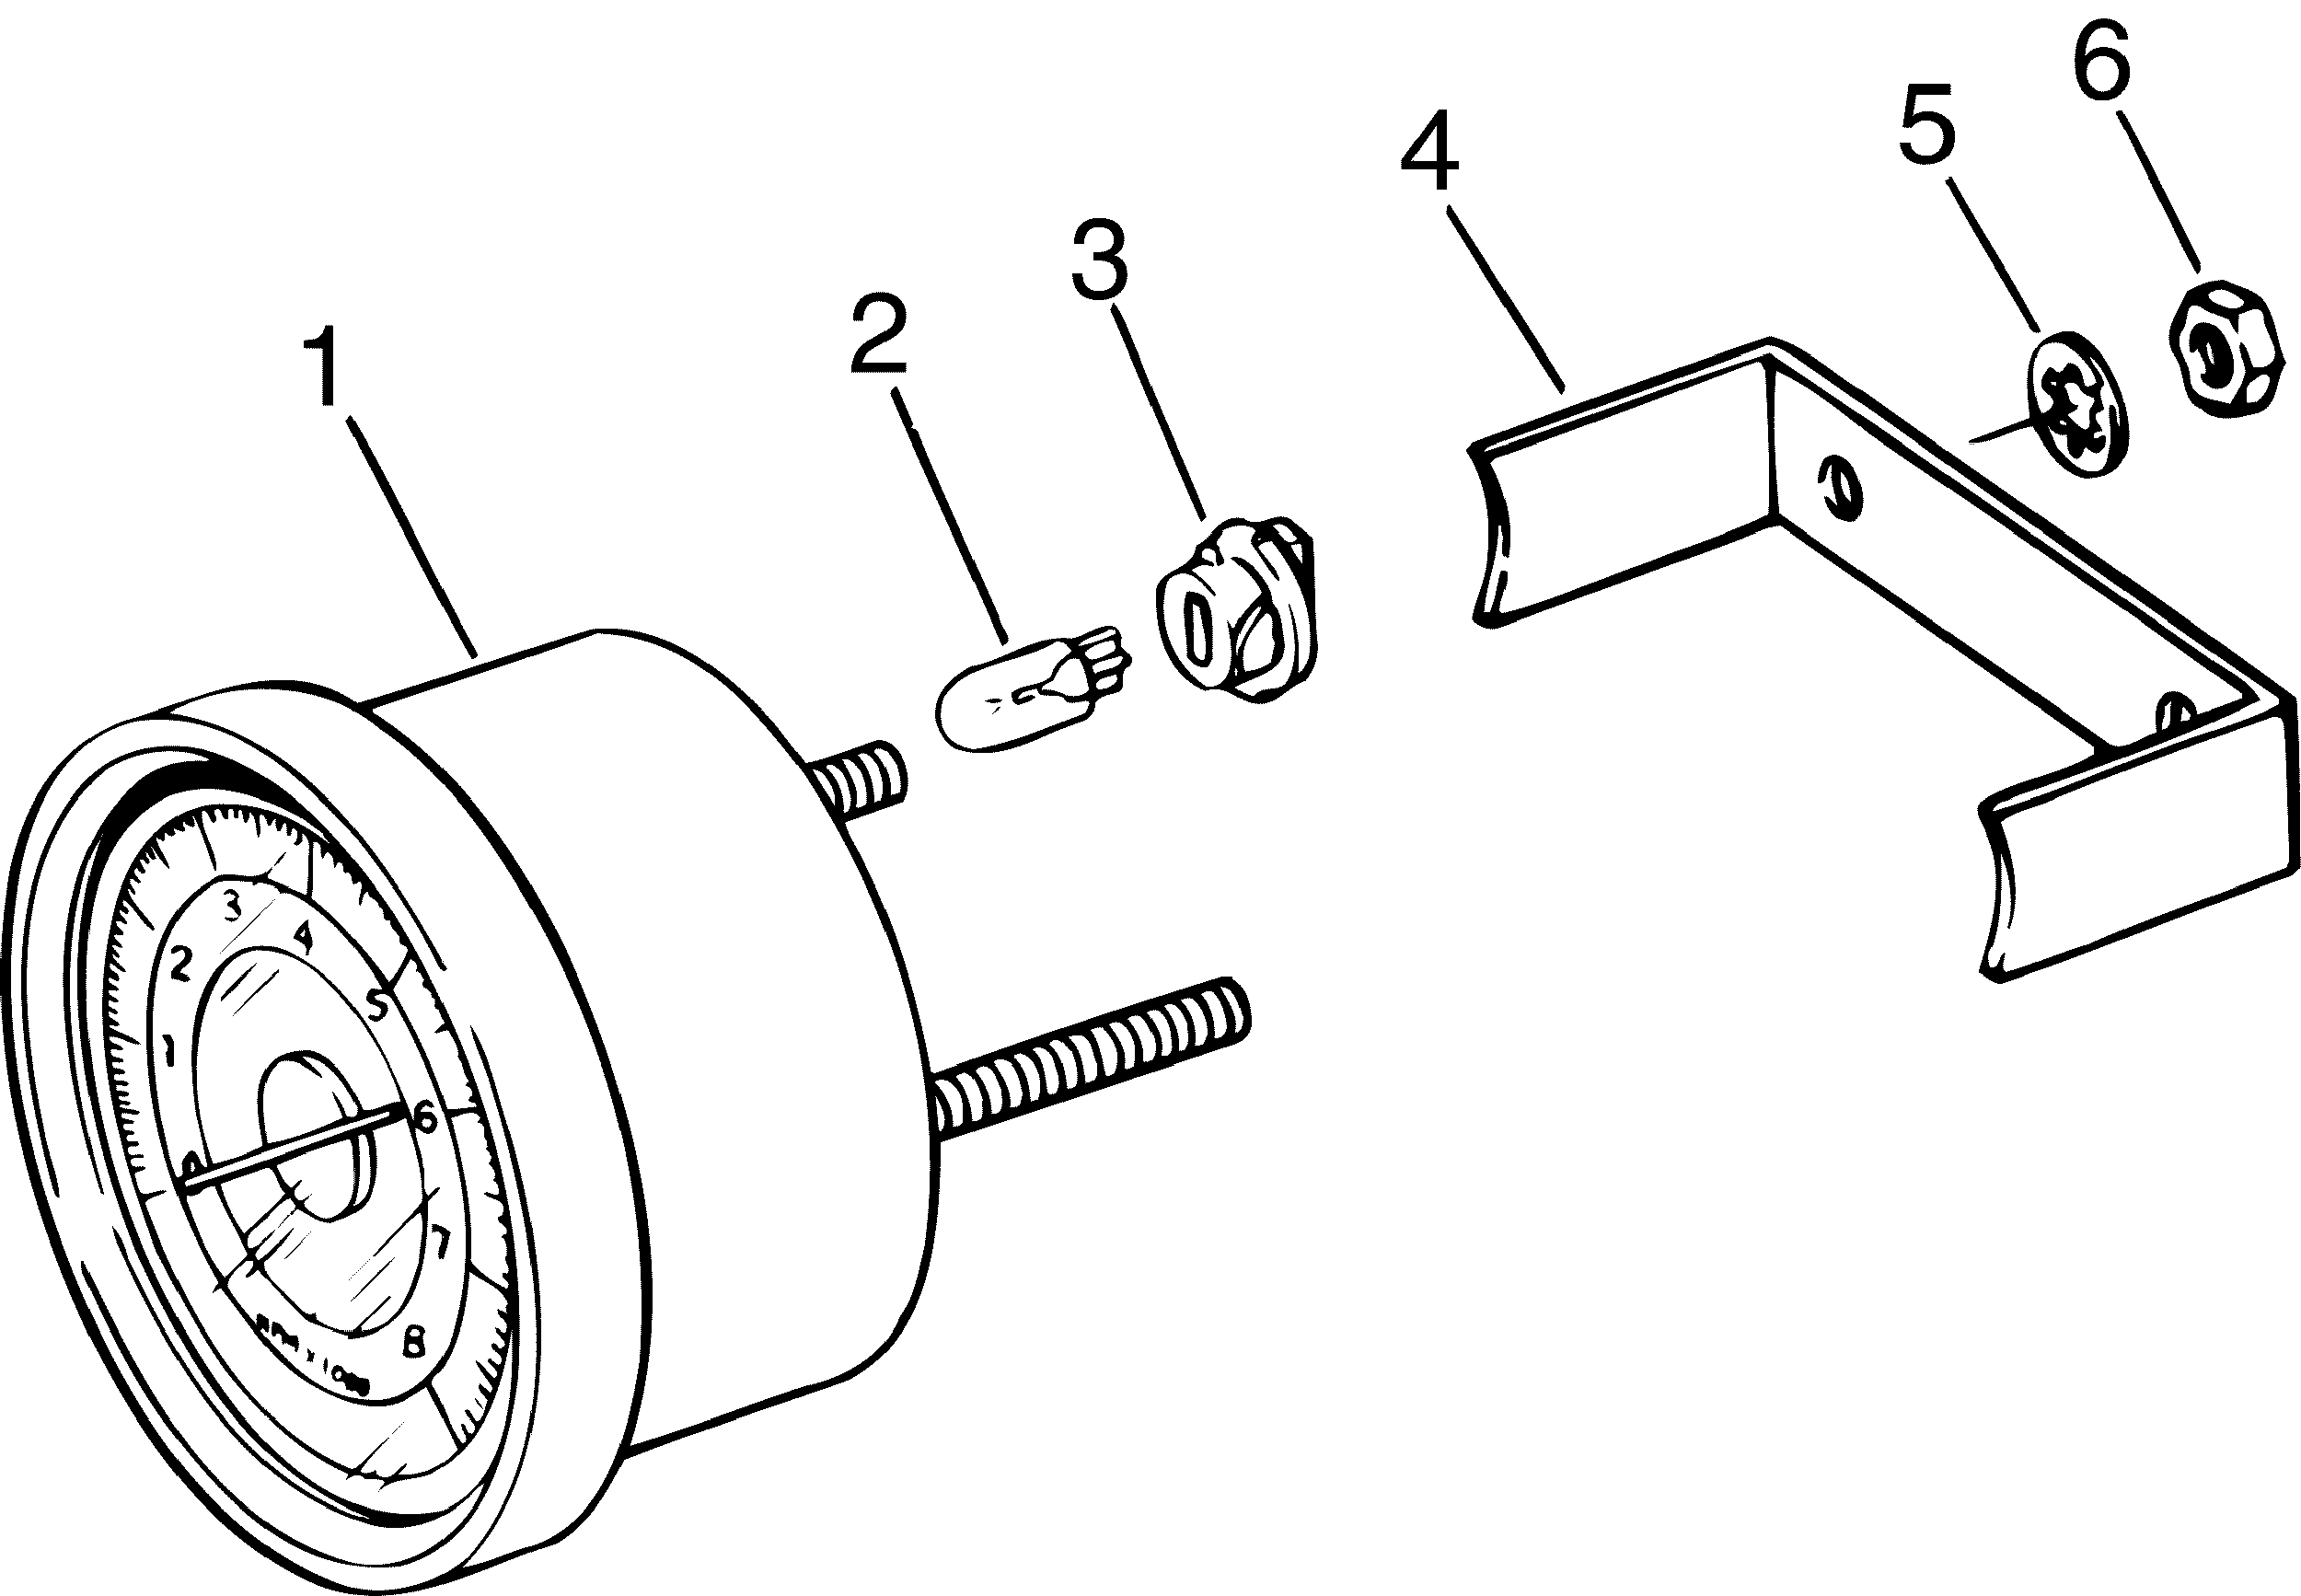 64064?resize\\\\\\\=665%2C461\\\\\\\&ssl\\\\\\\=1 sunpro tachometer wiring diagram & sunpro tach to hei wiring auto meter wiring diagram at edmiracle.co